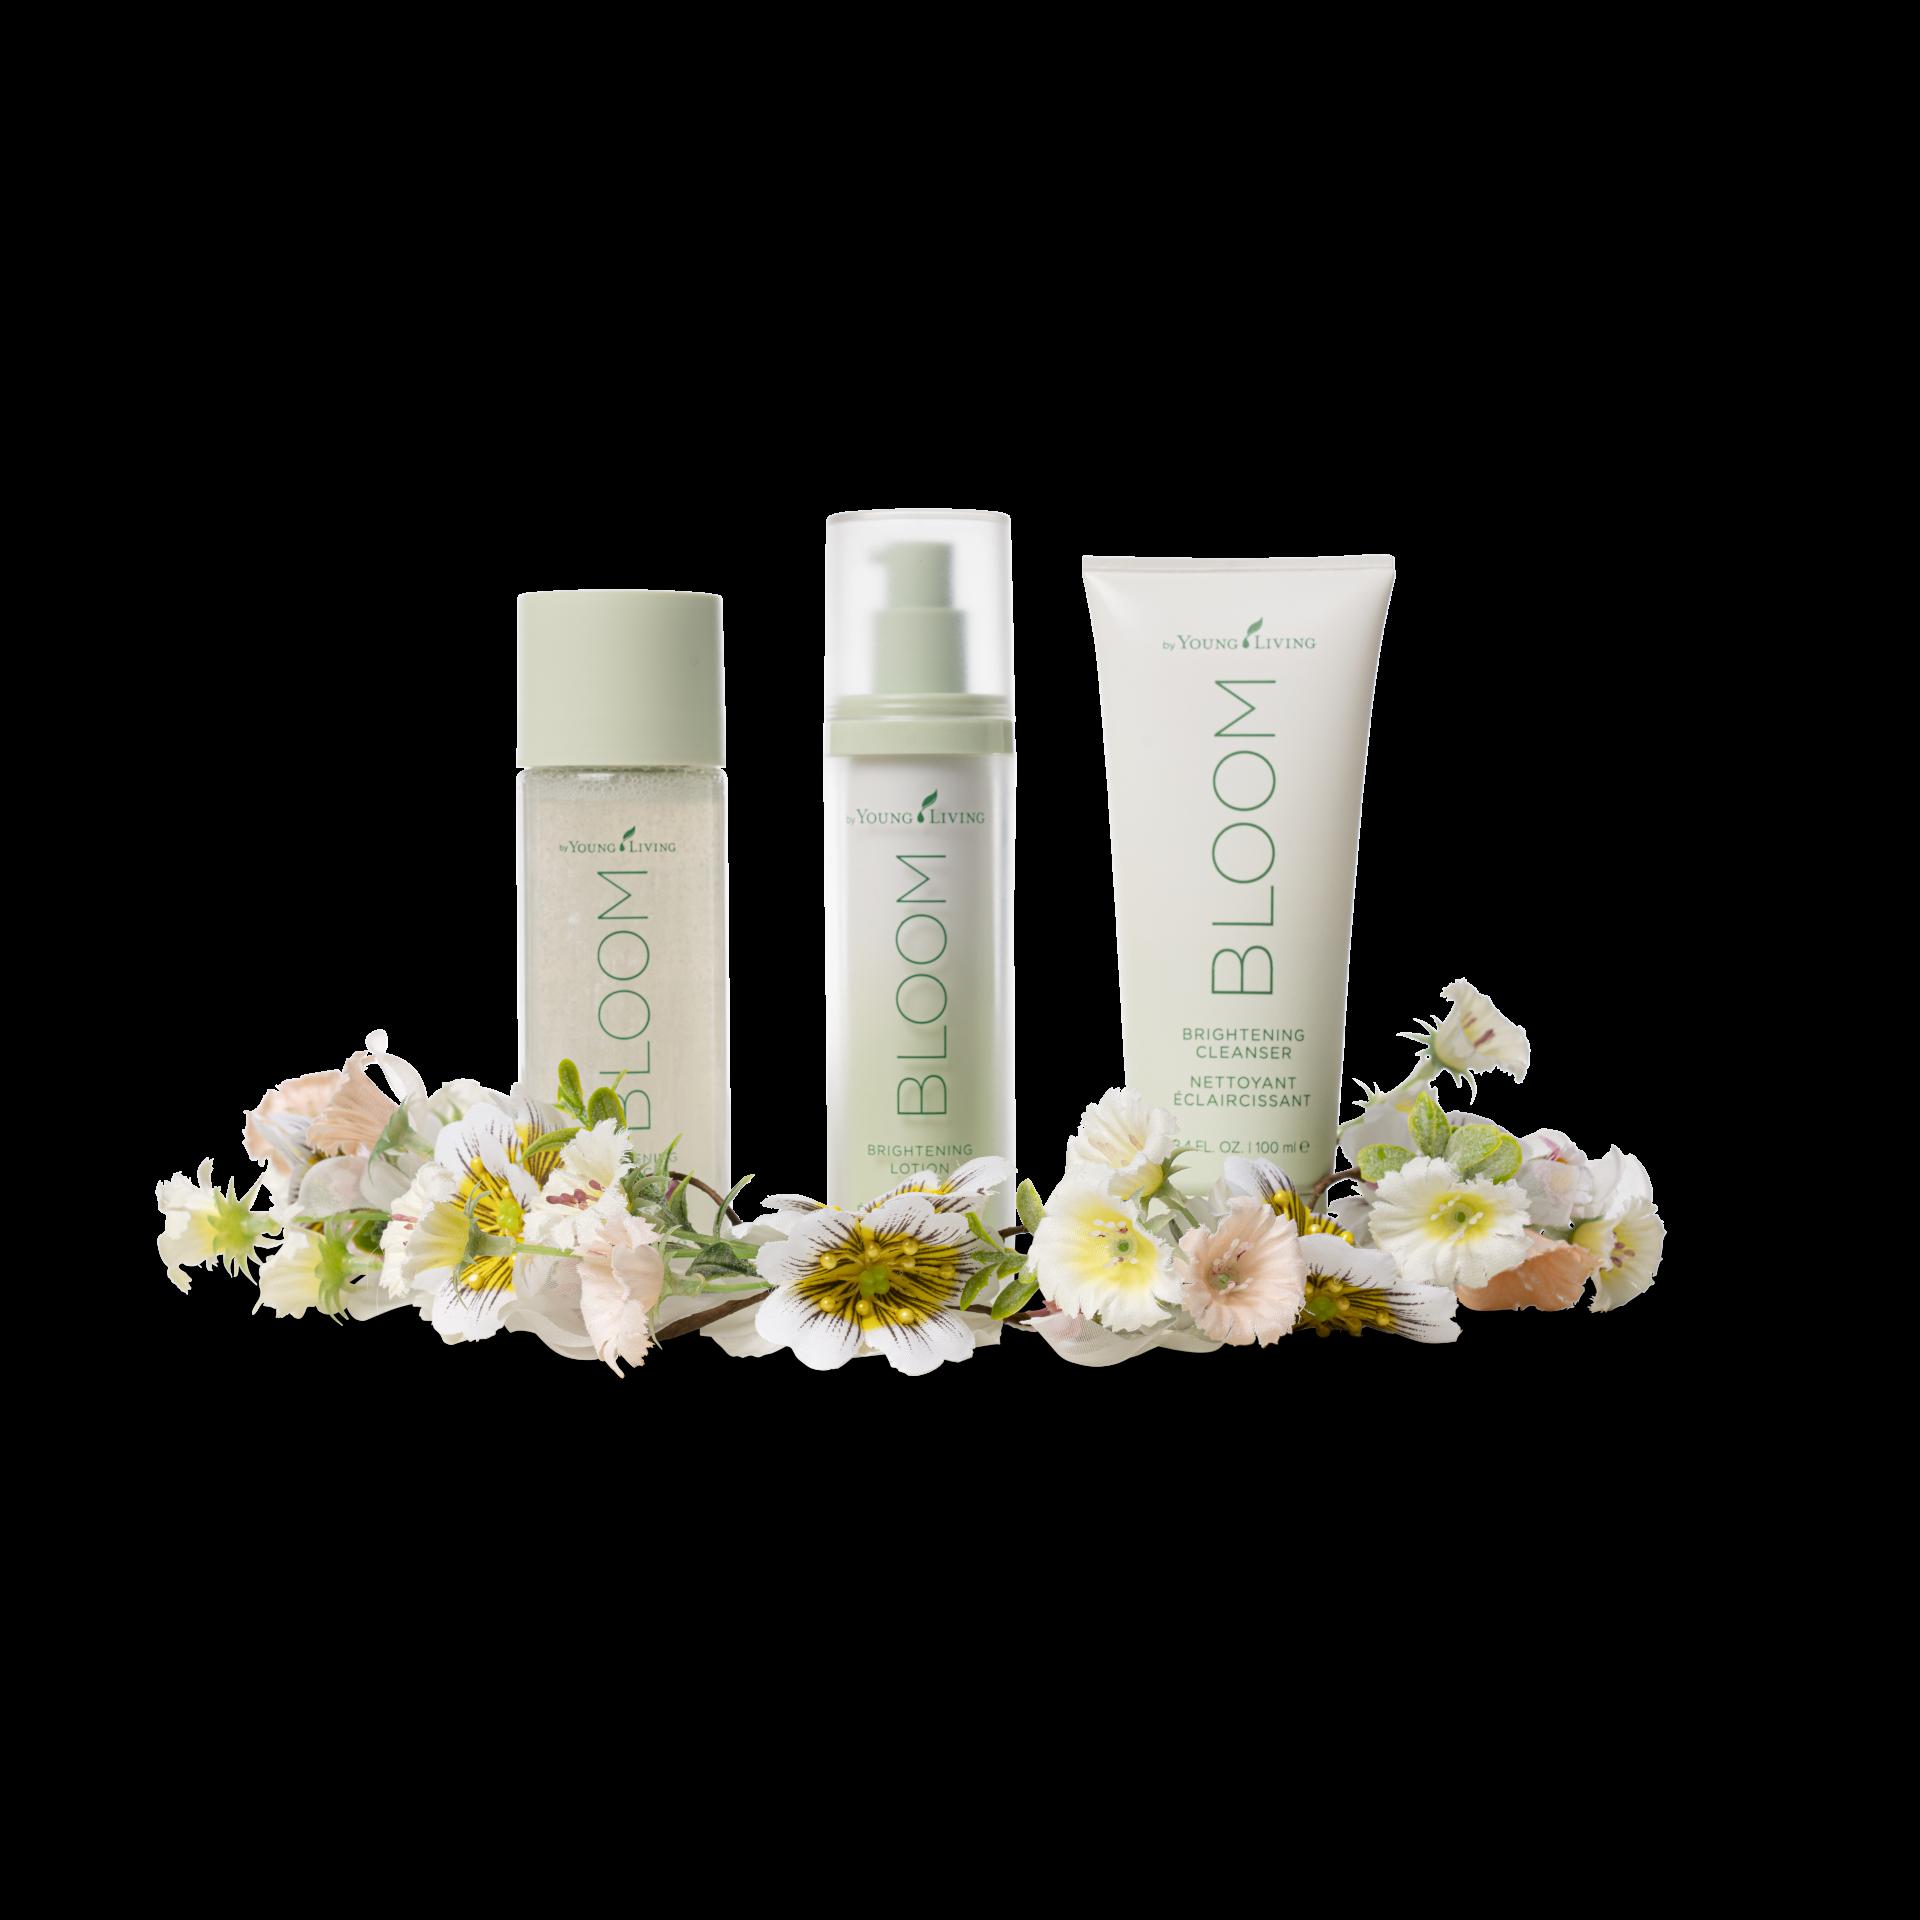 Young Living Essential Oils Bloom Skincare Line